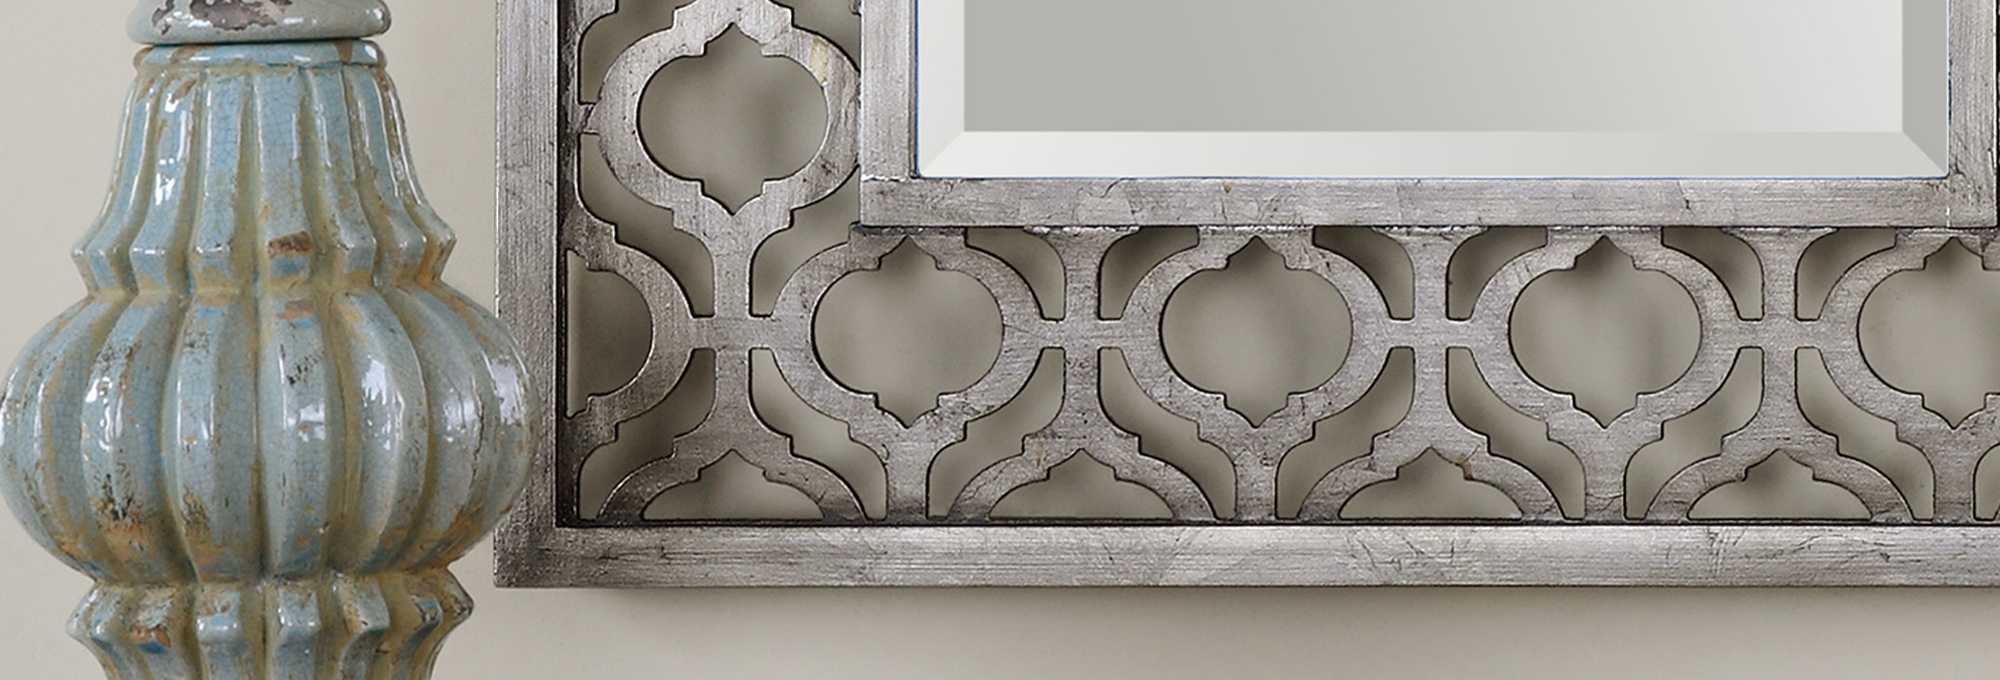 Shop Decorative Mirrors